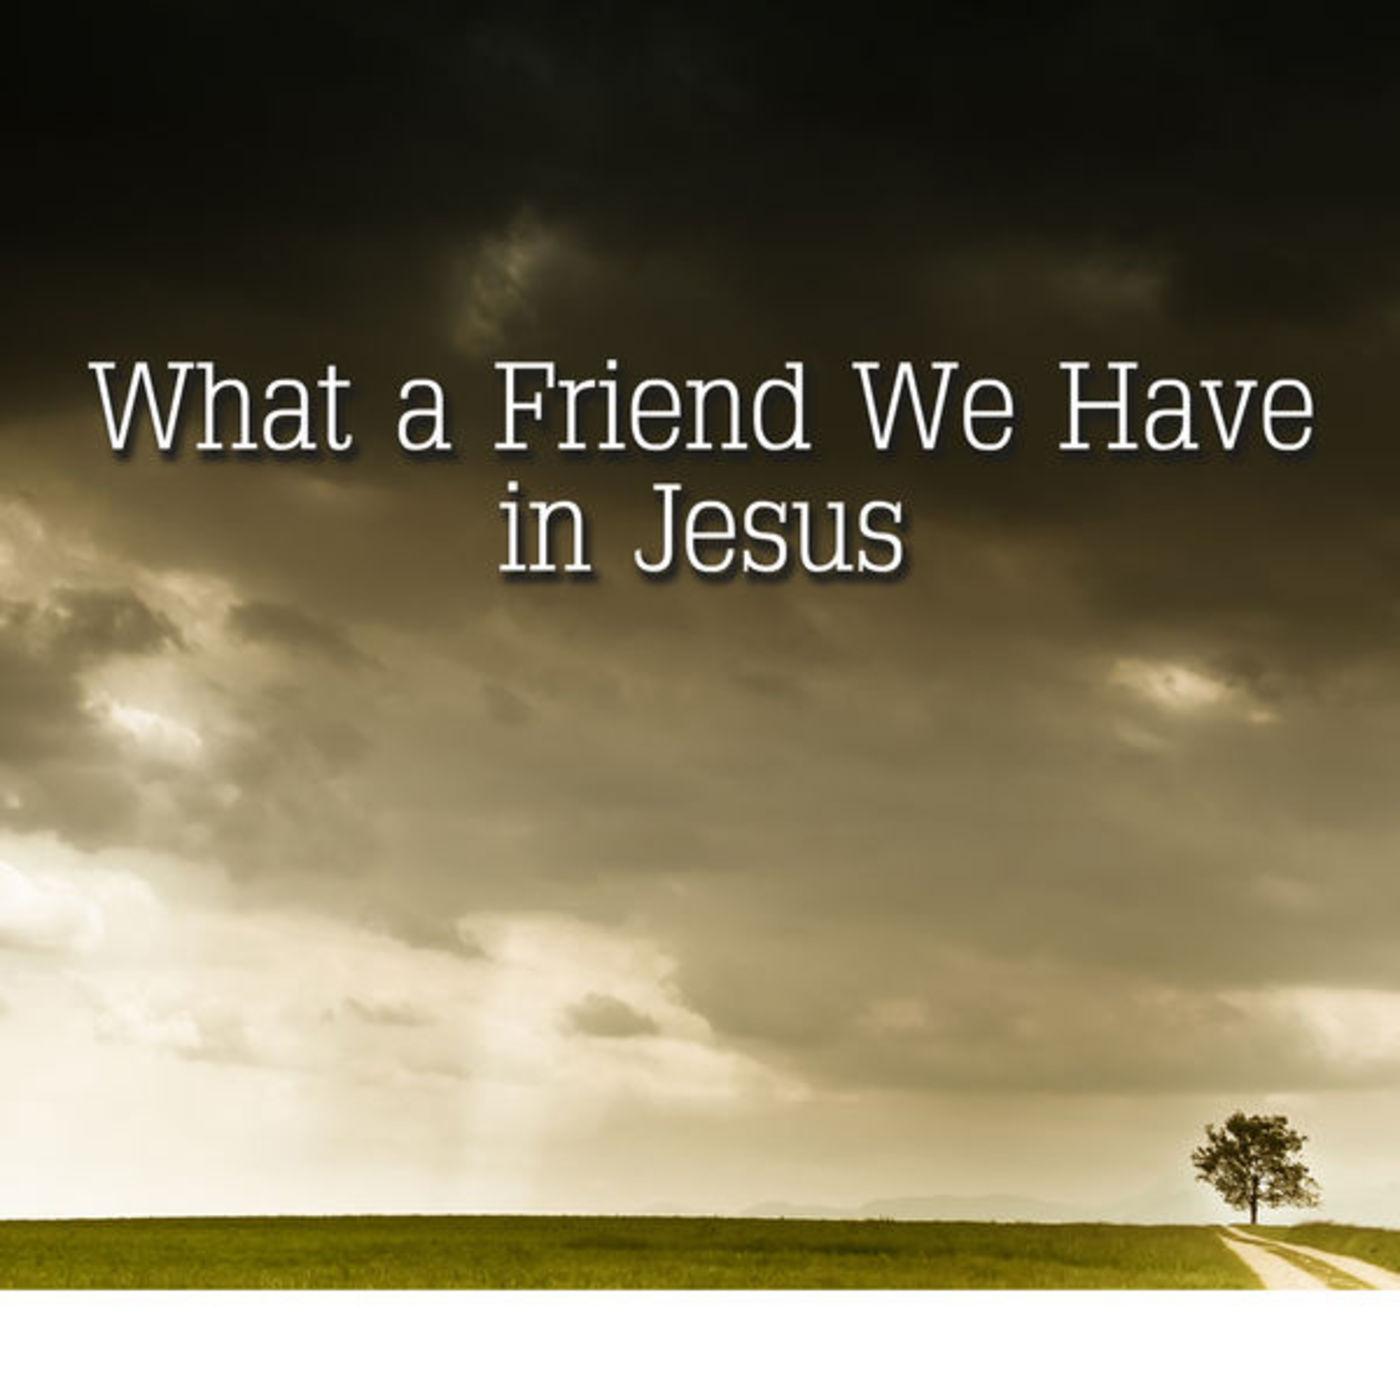 What a Friend in Jesus 4